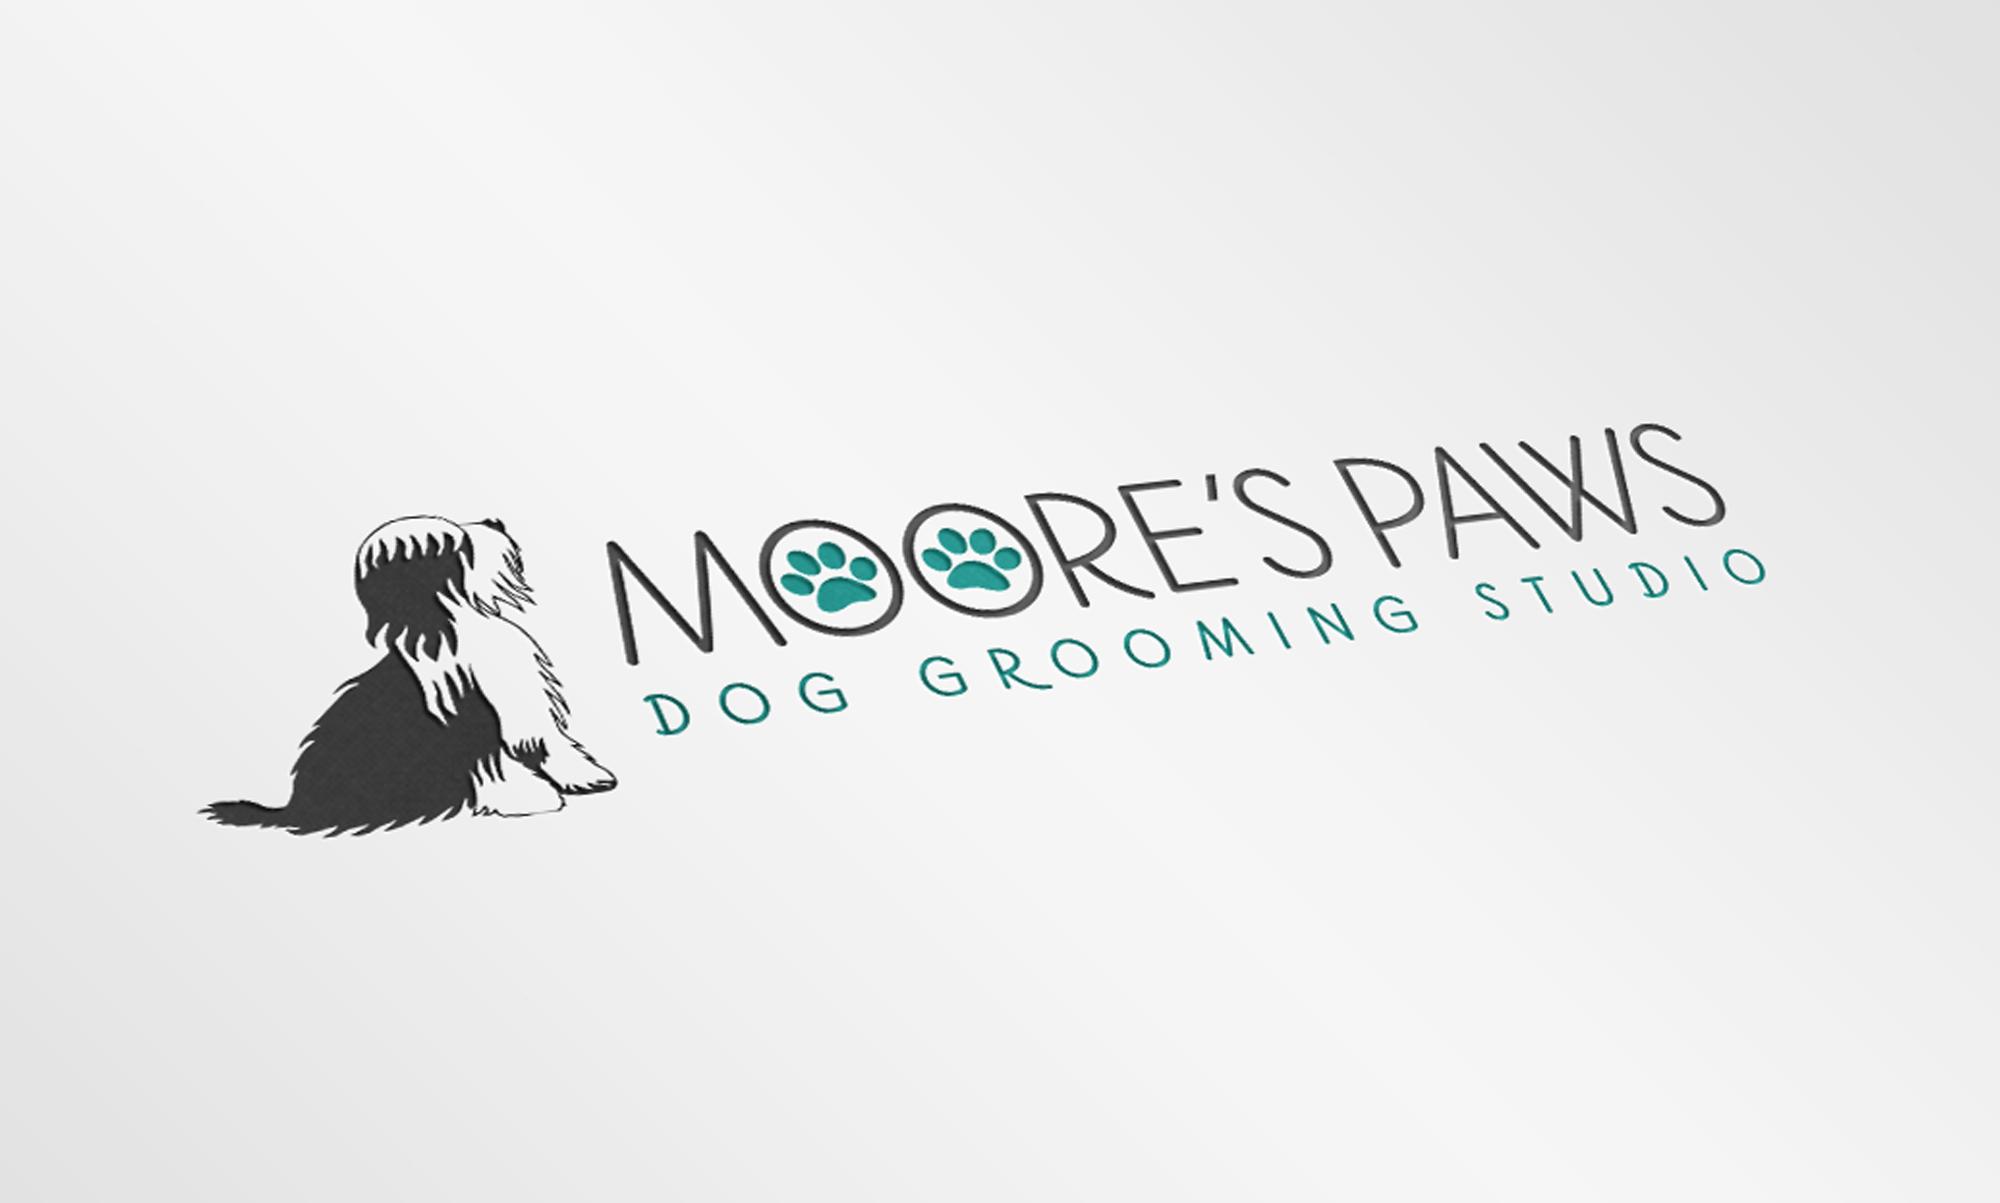 Logo Design for Dog Groomers